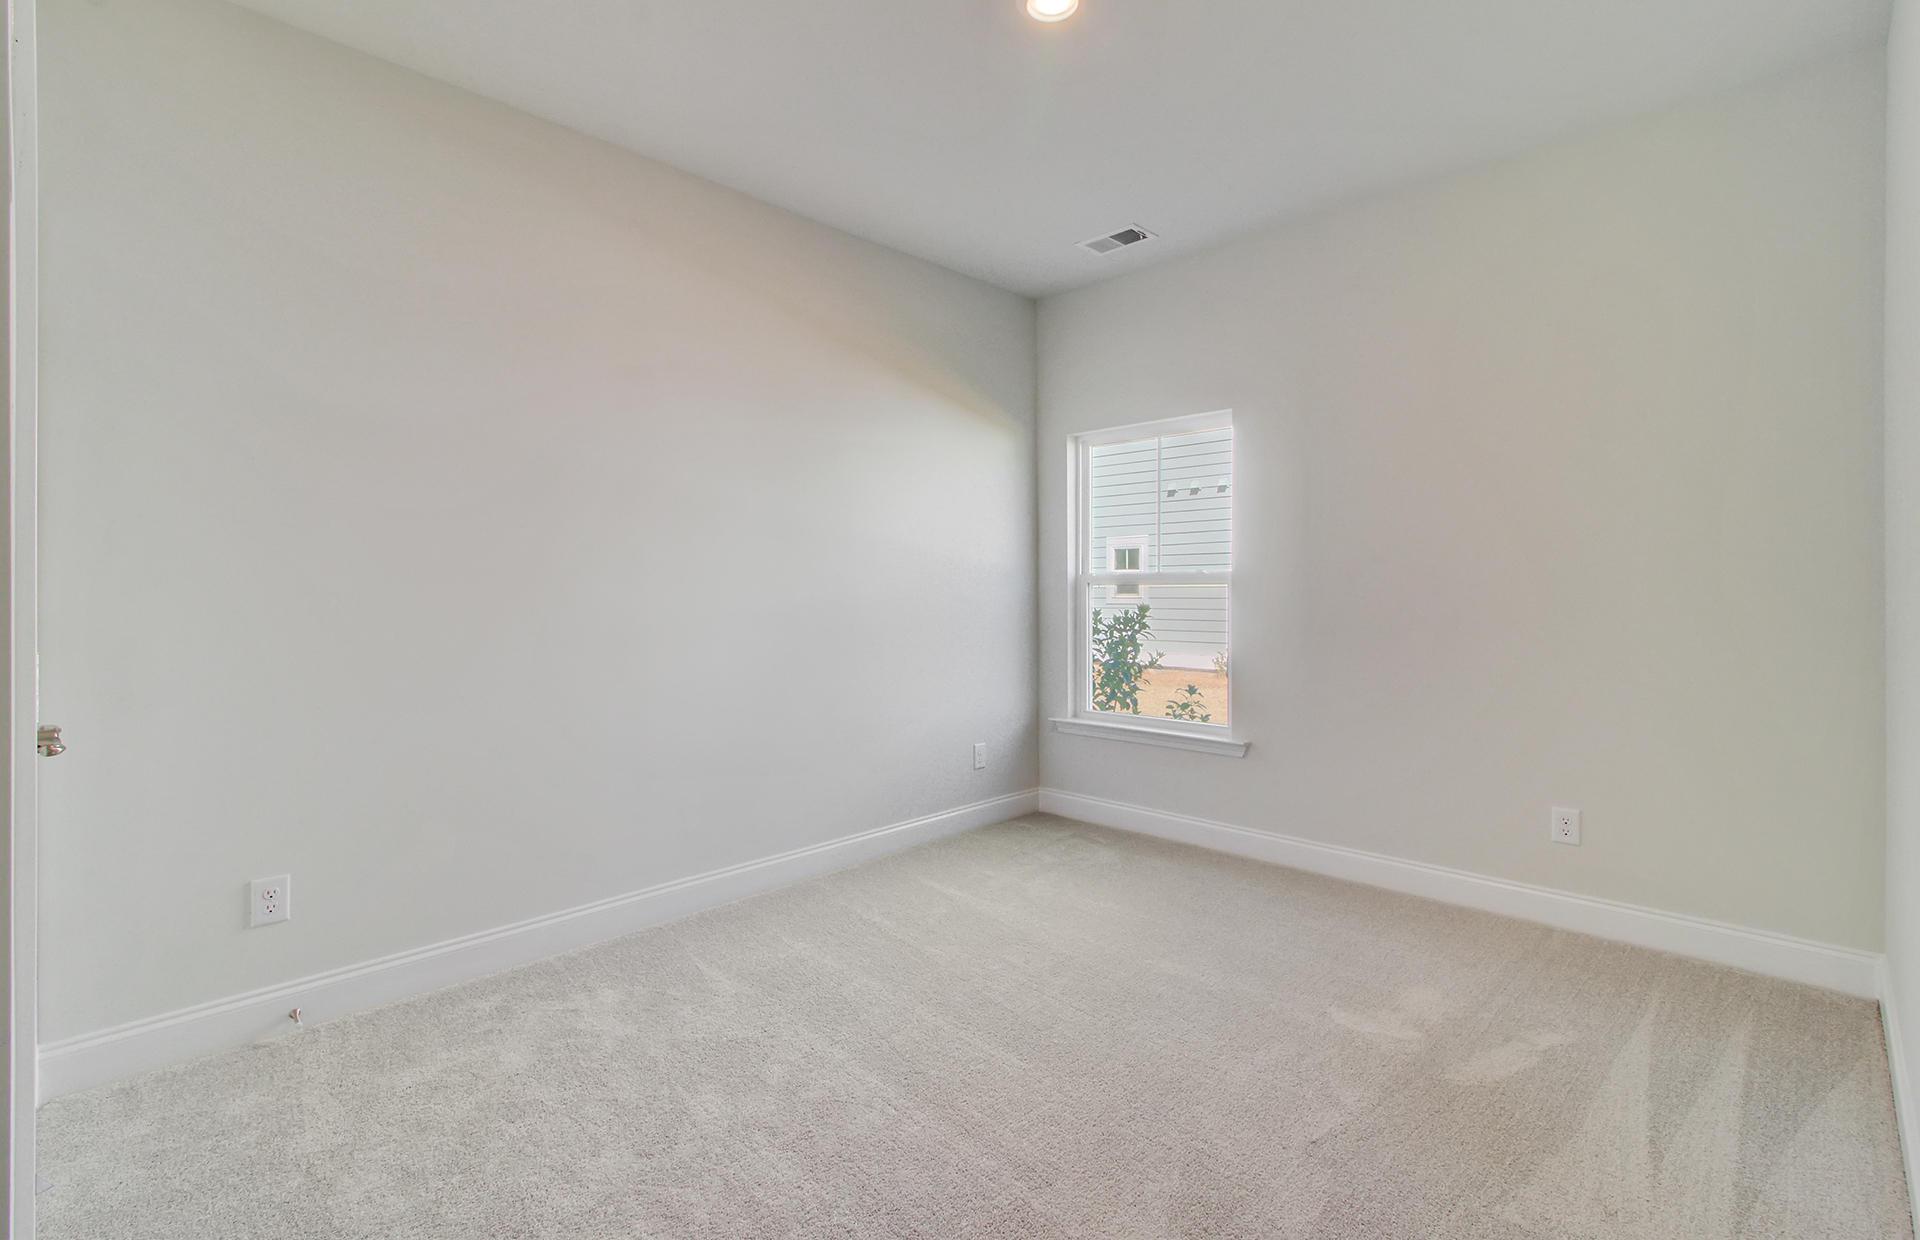 Park West Homes For Sale - 3062 Rice Field, Mount Pleasant, SC - 7